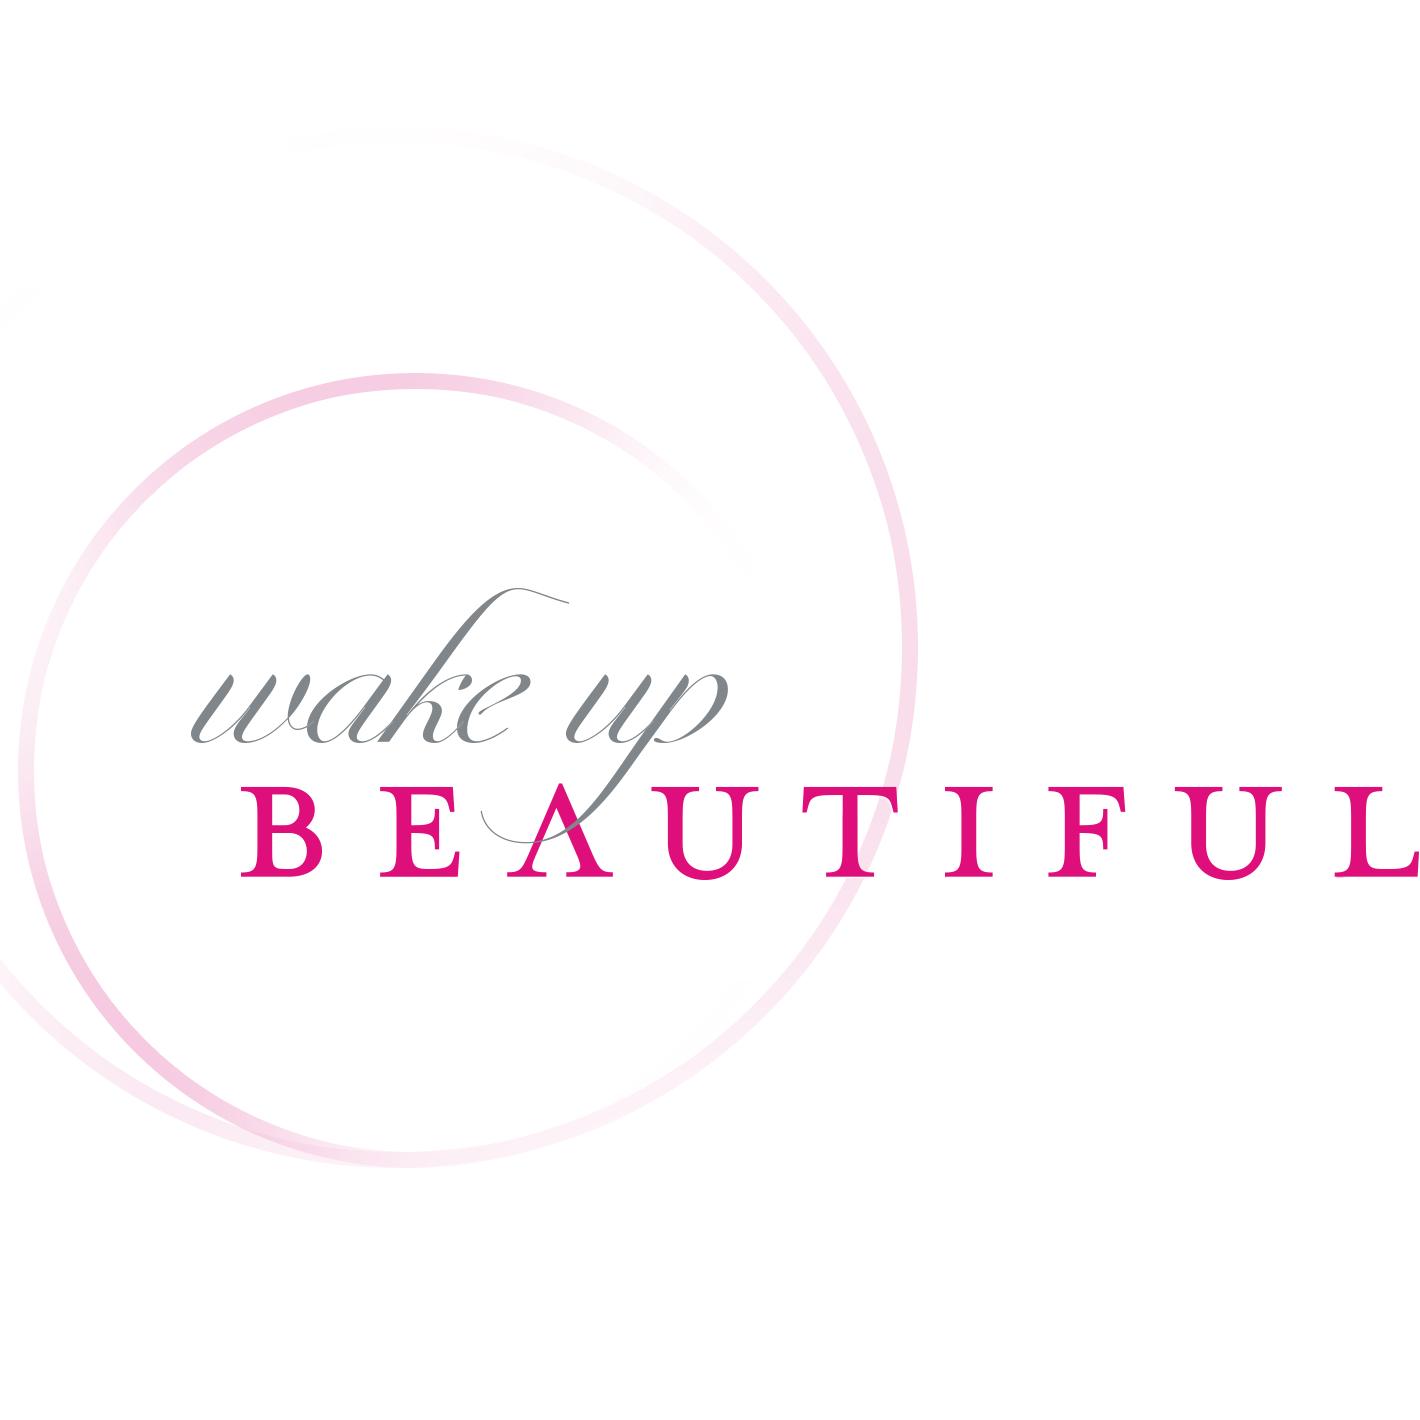 Wake Up Beautiful Spa - Laguna Niguel, CA - Spas